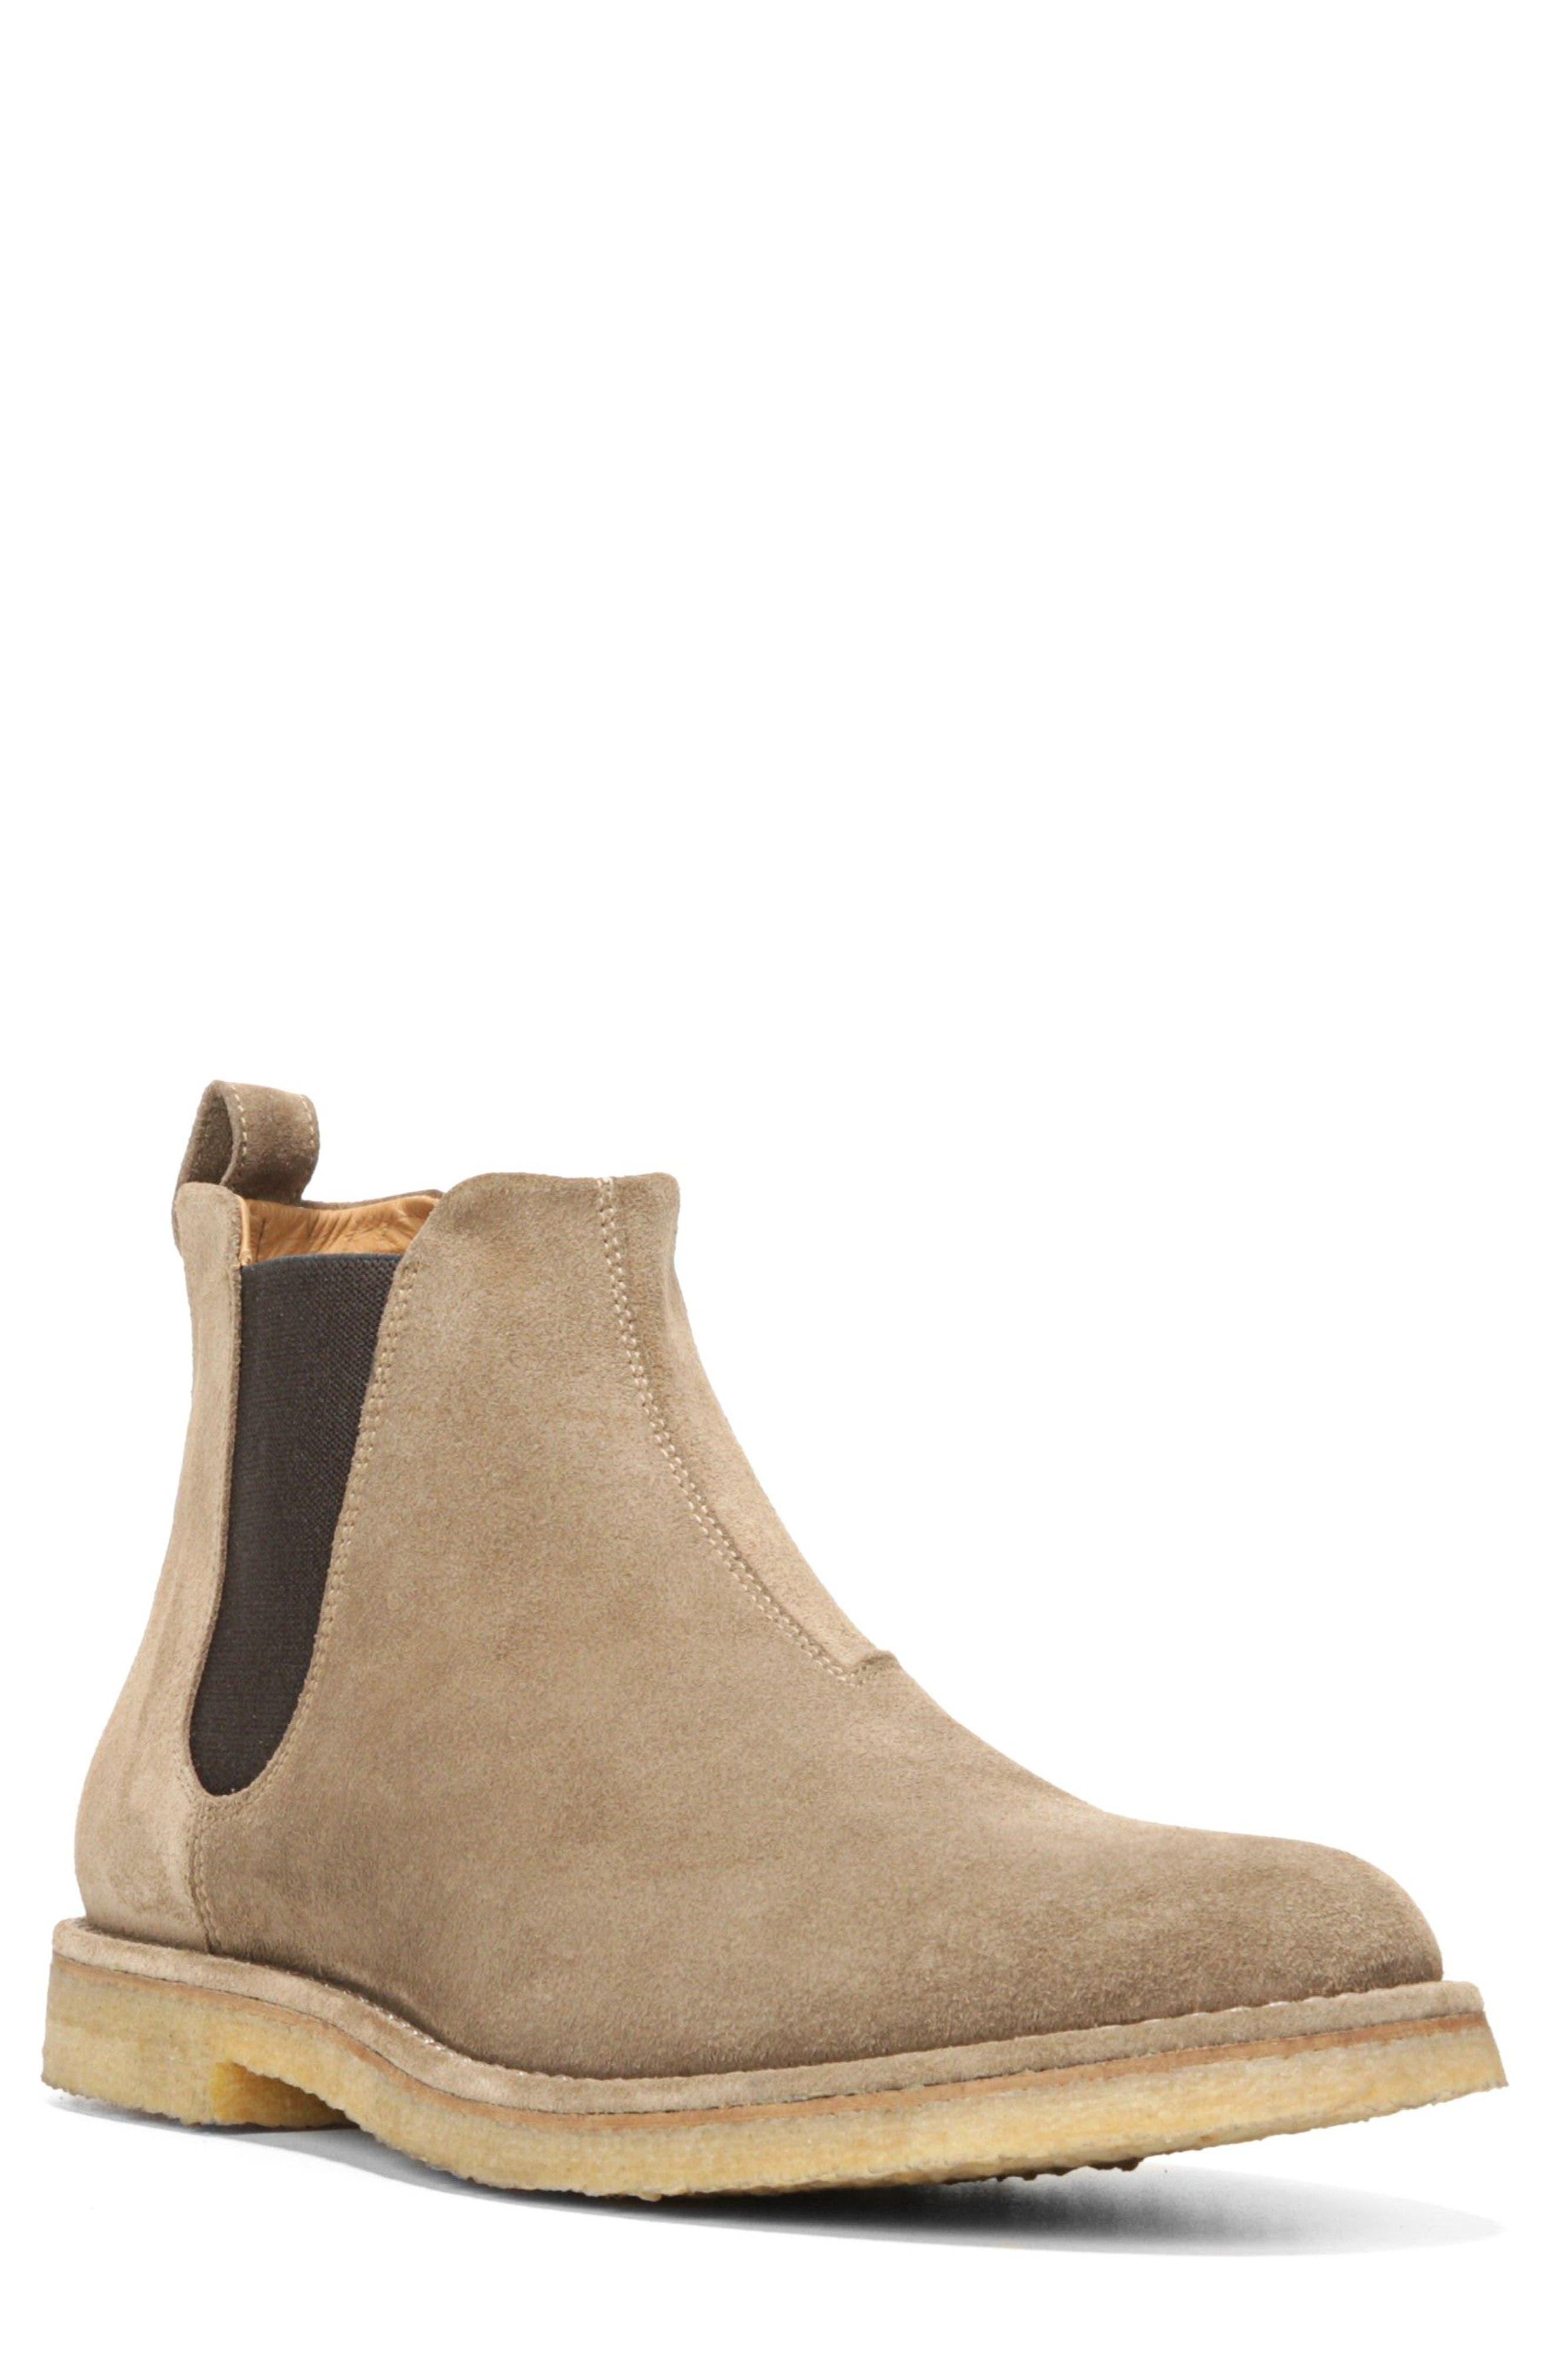 'Sawyer' Chelsea Boot,                         Main,                         color, Flint Suede